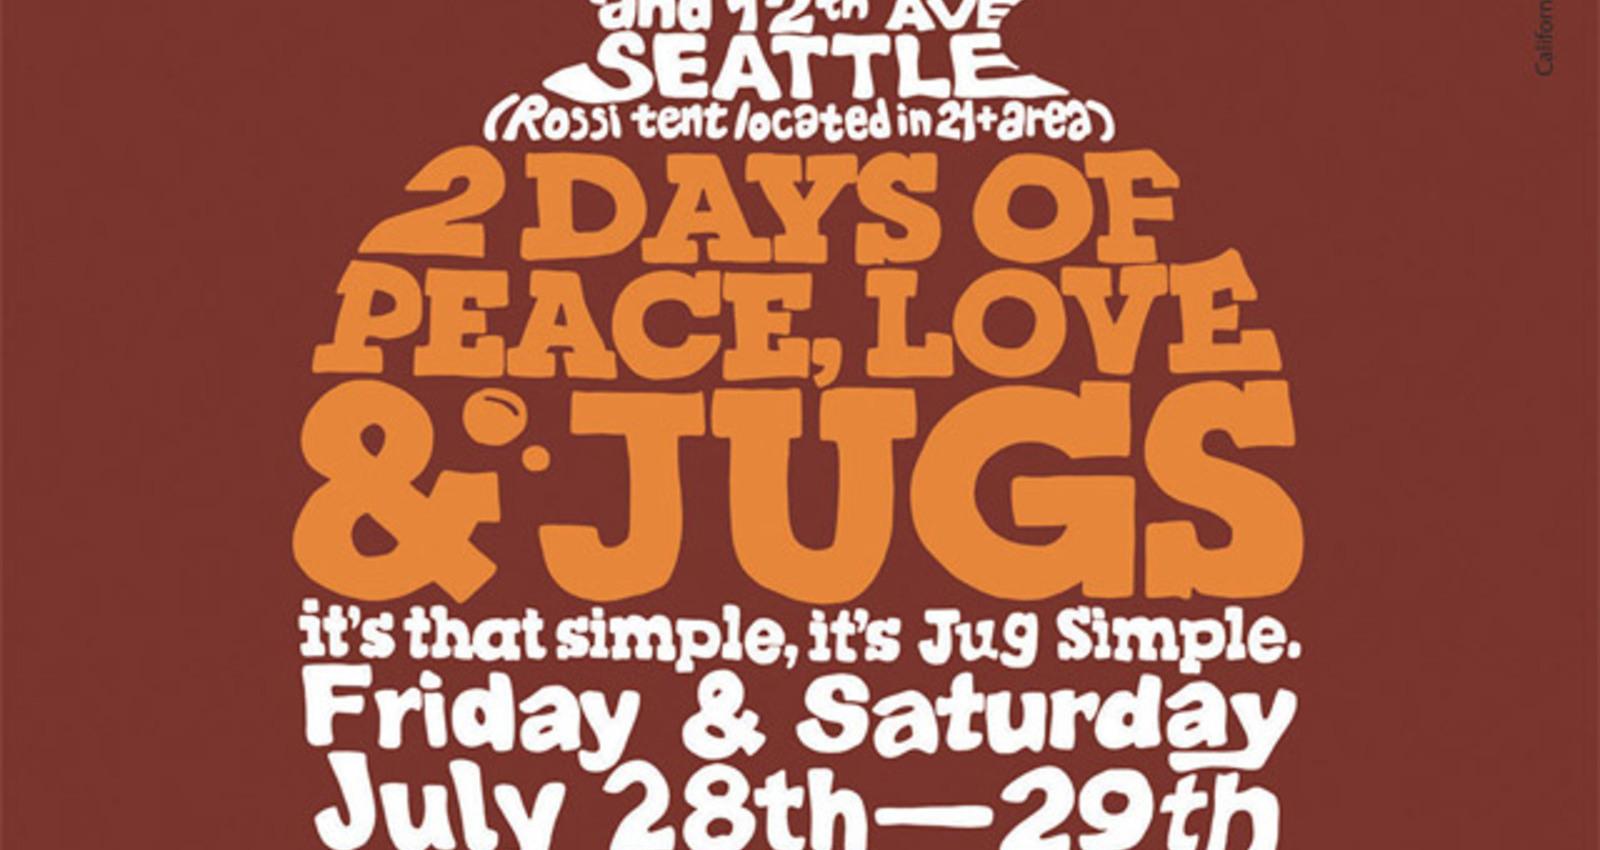 Jug Simple Furniture Tour